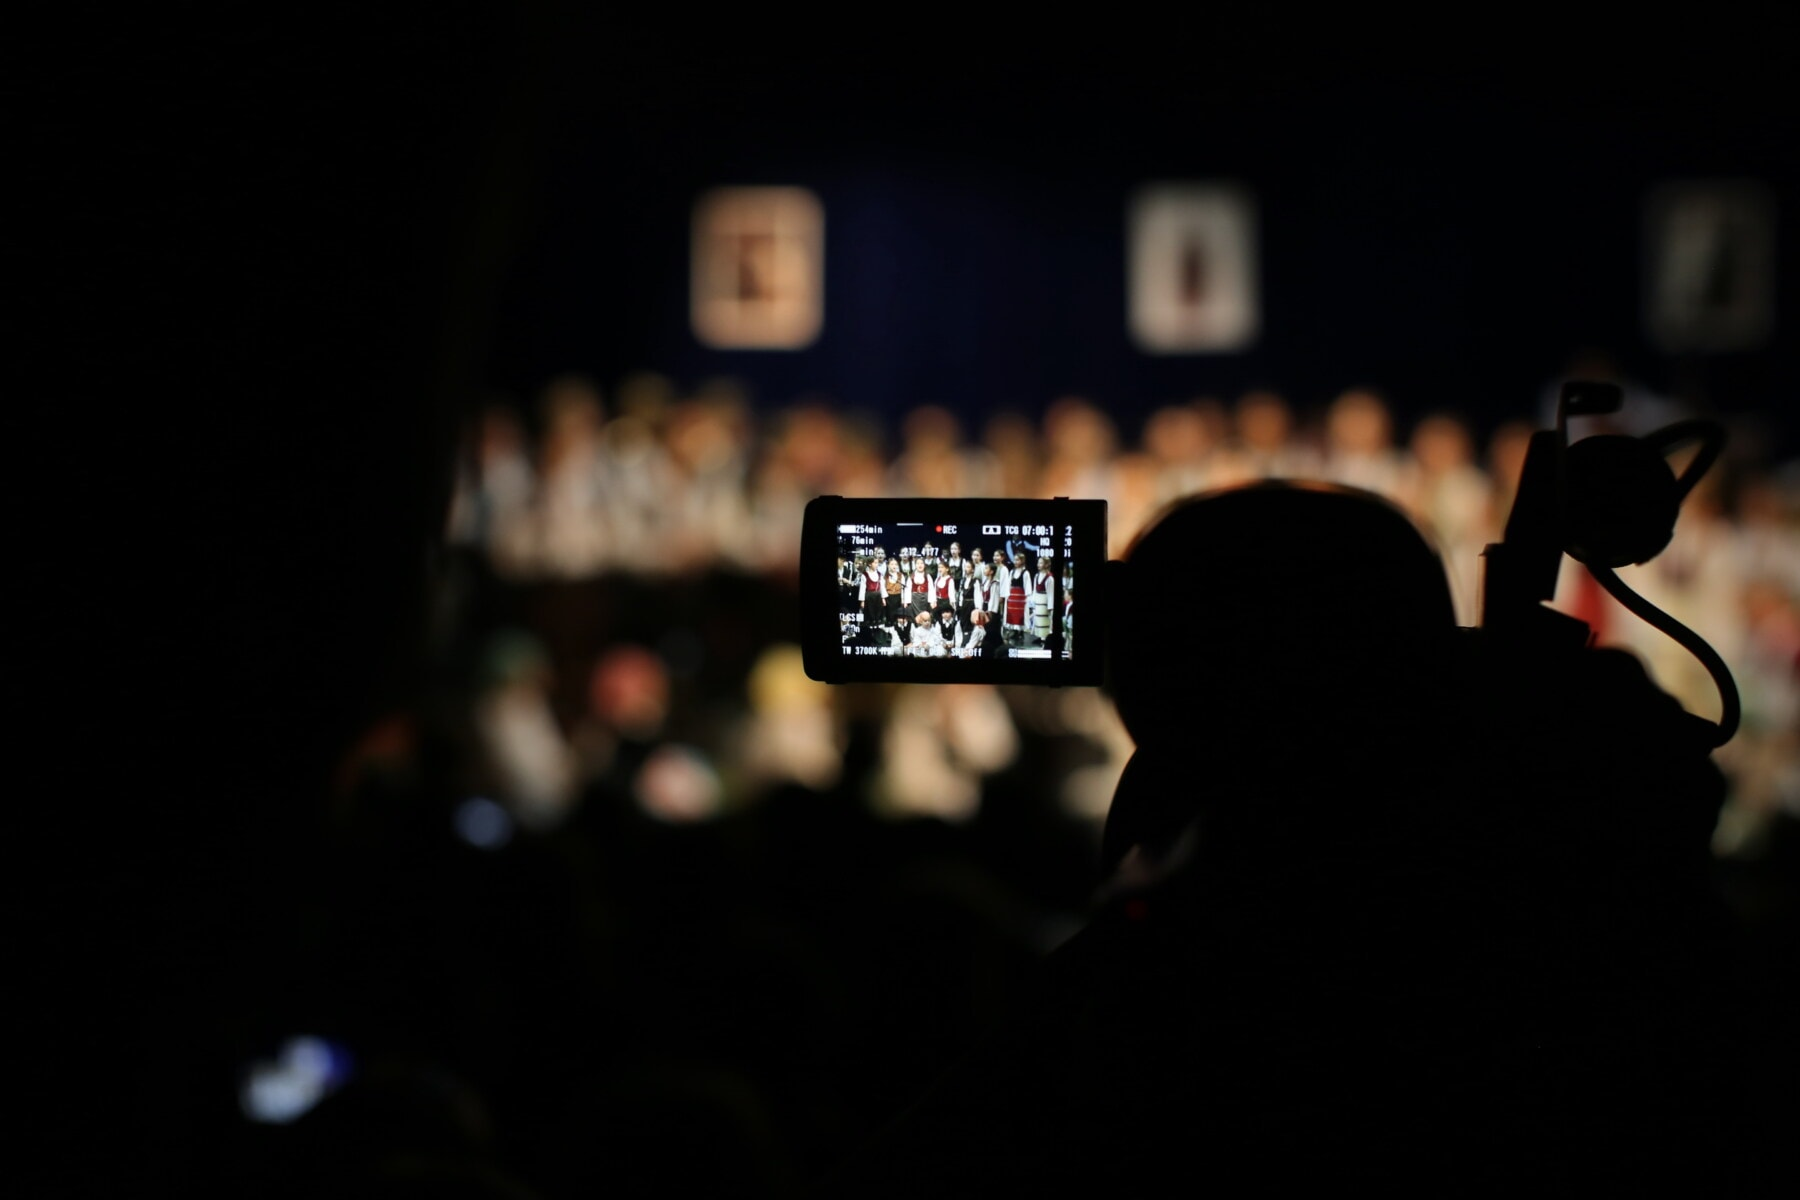 video recording, video, digital camera, dark, audience, auditorium, theater, darkness, people, blur